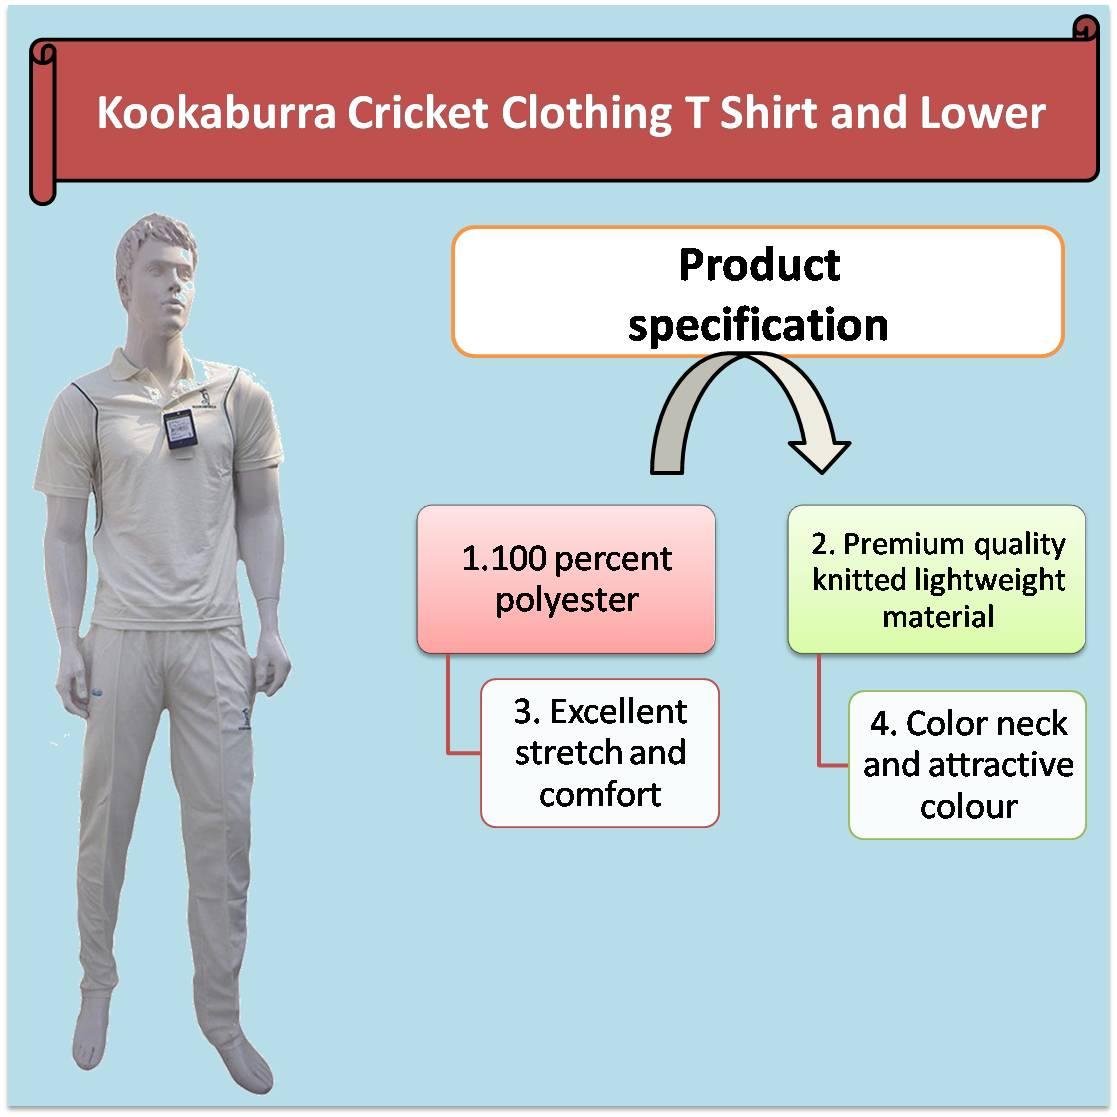 Kookaburra Cricket Clothing T Shirt and Lower